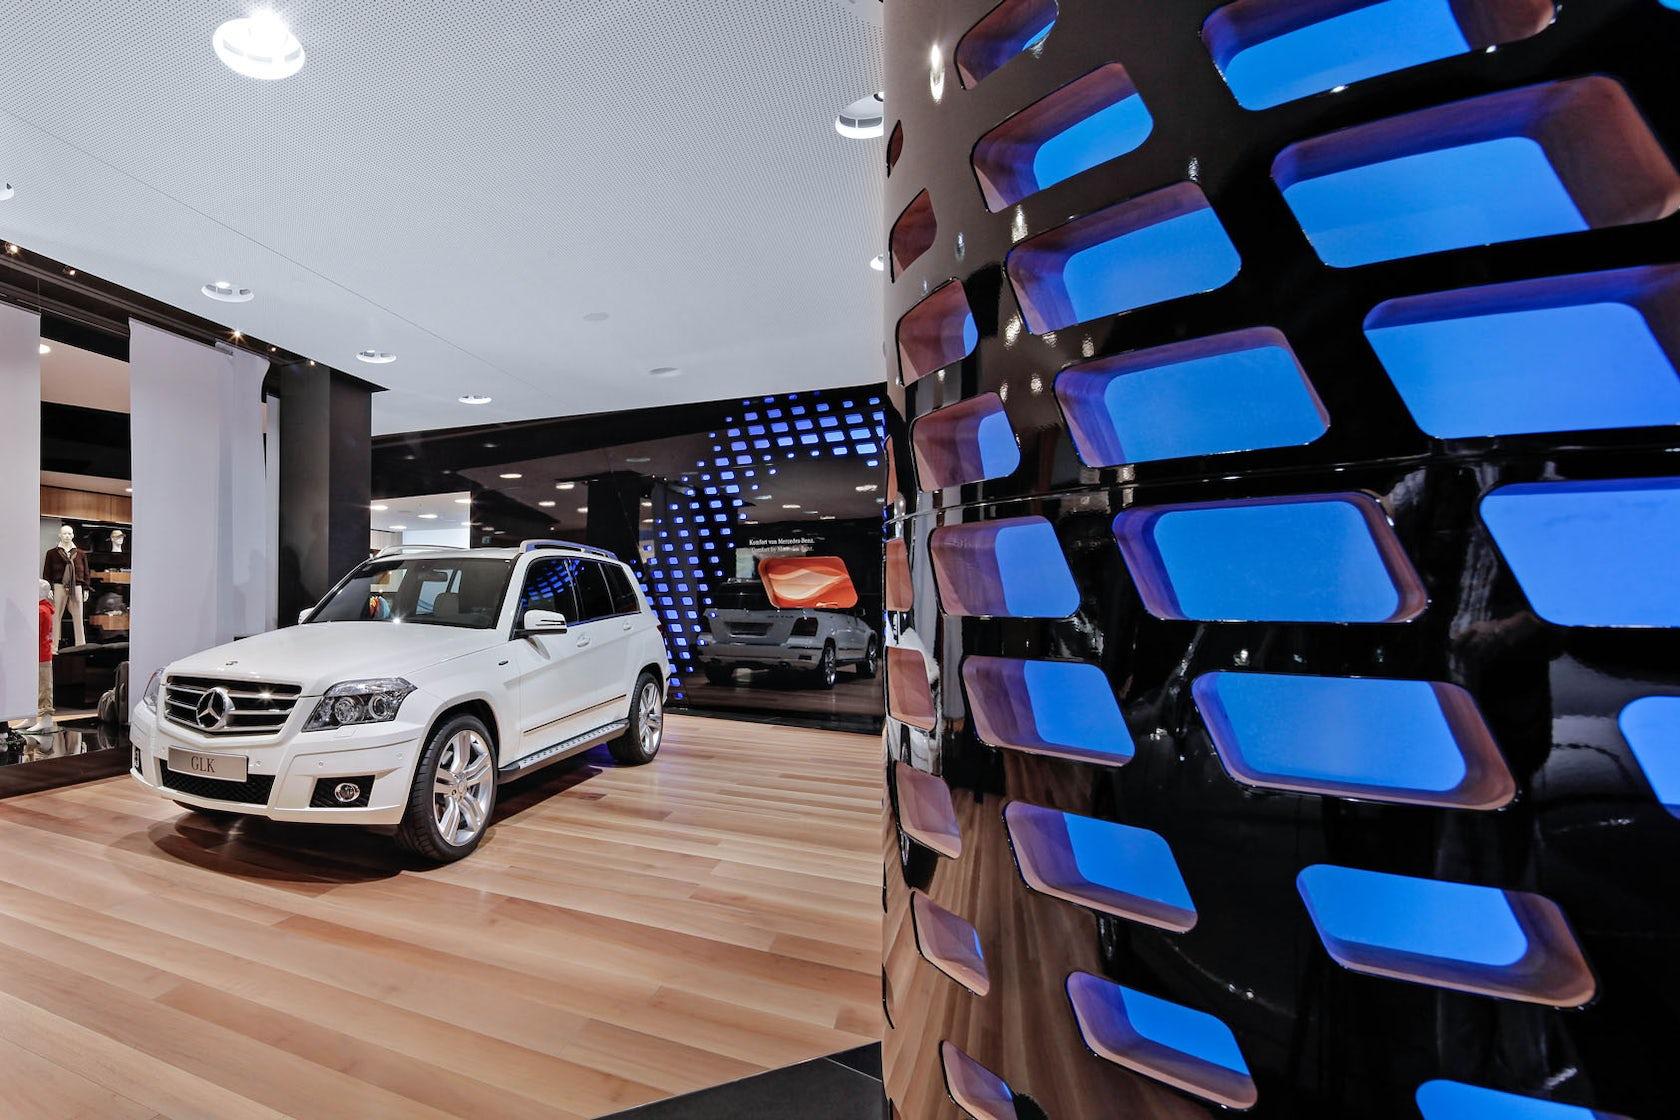 Showroom 39 mercedes benz gallery 39 berlin architizer for Mercedes benz call center